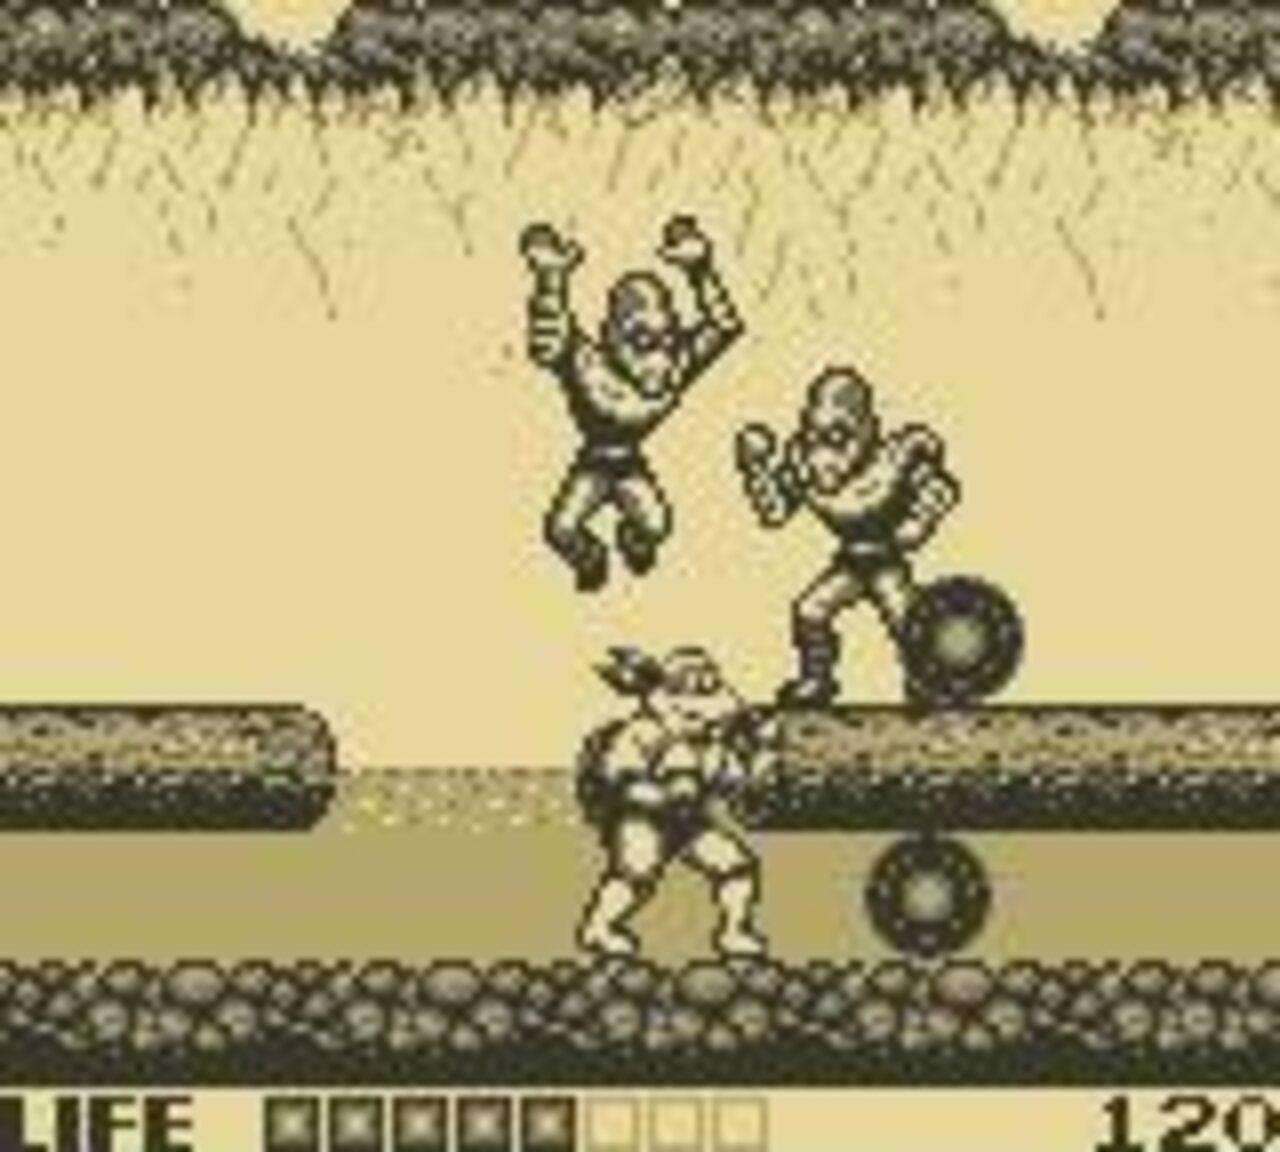 Teenage Mutant Ninja Turtles: Fall of the Foot Clan Game Boy